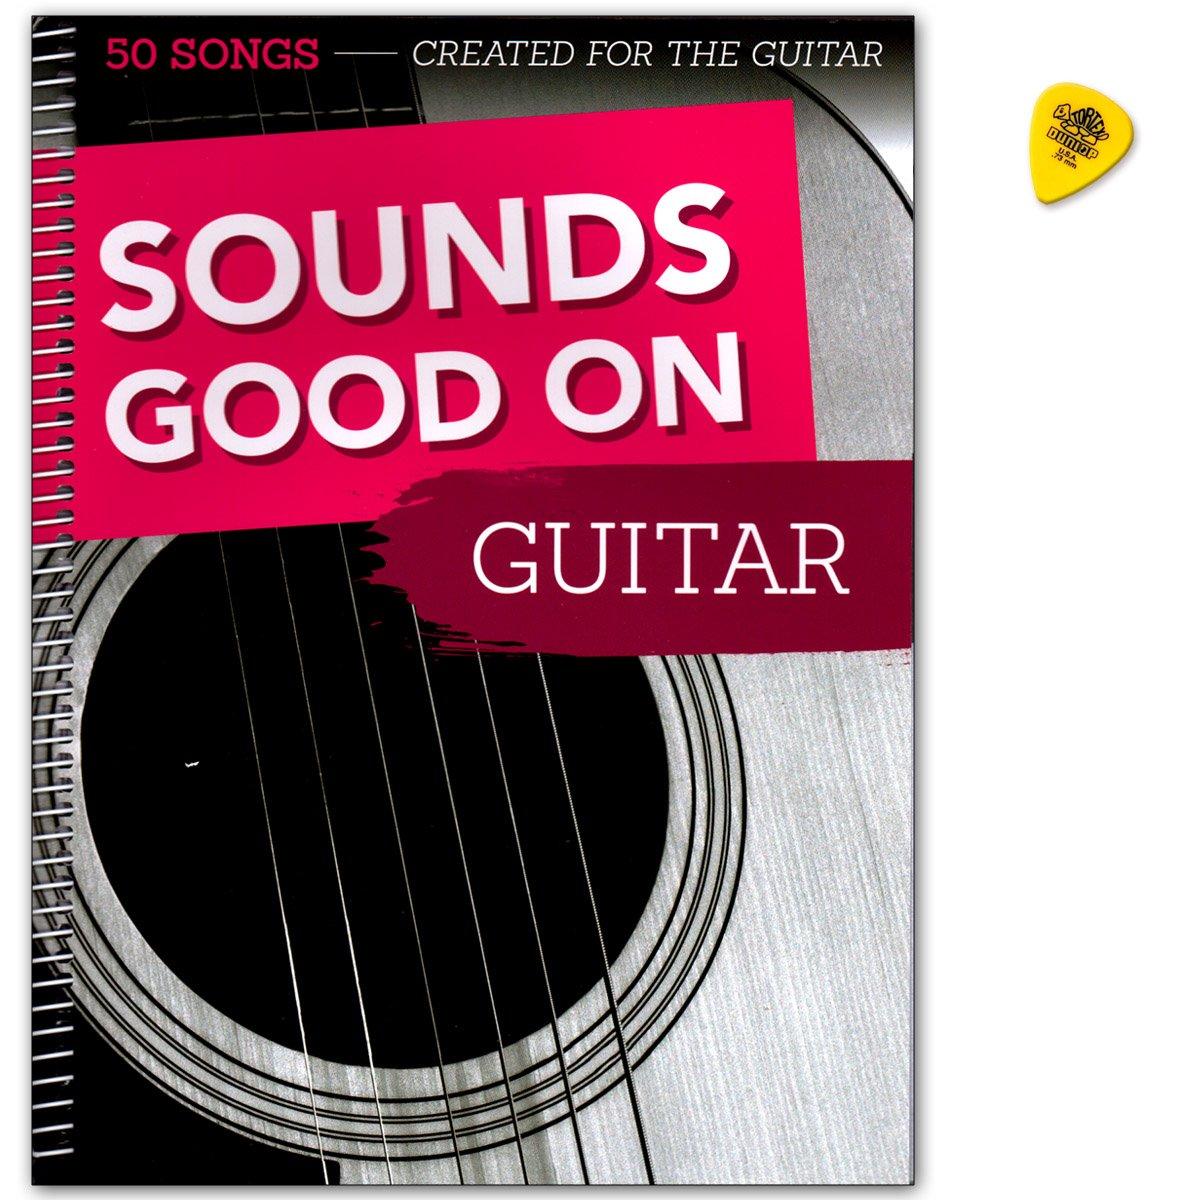 Sounds Good on Guitar: 50 Canciones crea Ted for the Guitar – Songbook en ligero hasta mittelschweren Arrangements – con Dunlop Púa: Amazon.es: Instrumentos musicales